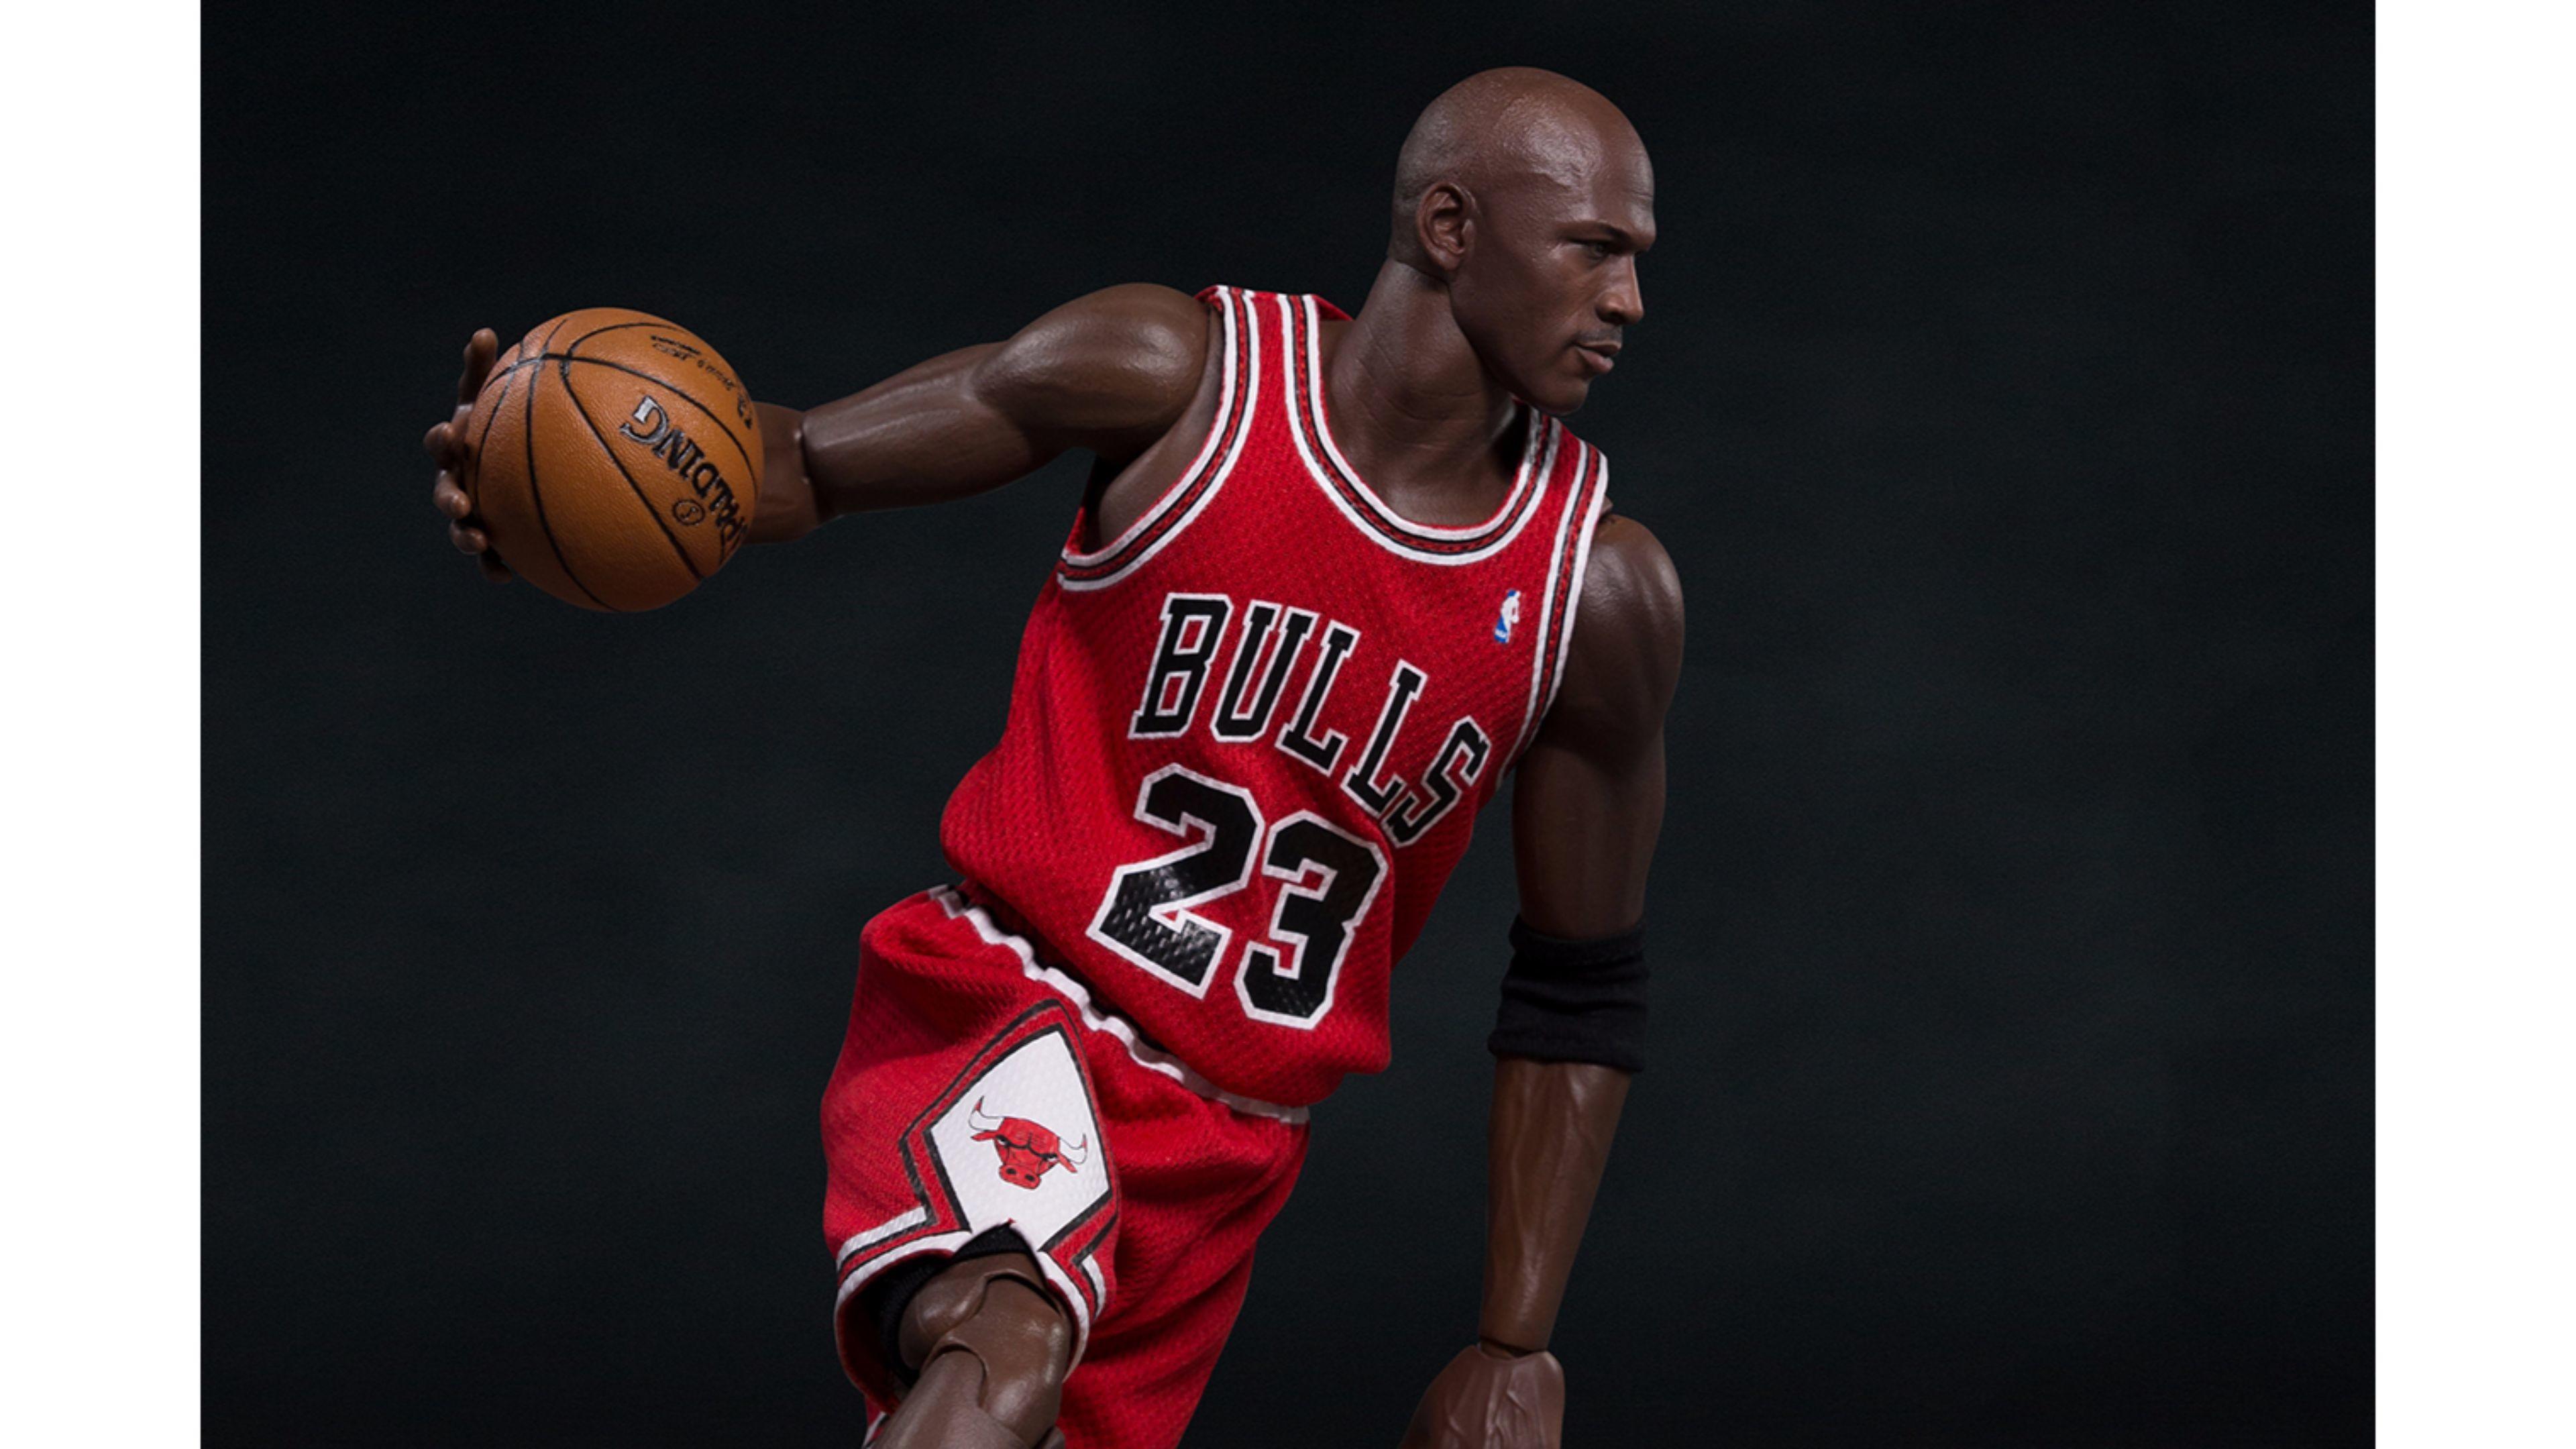 Chicago Bulls #23 Michael Jordan 4K Wallpaper